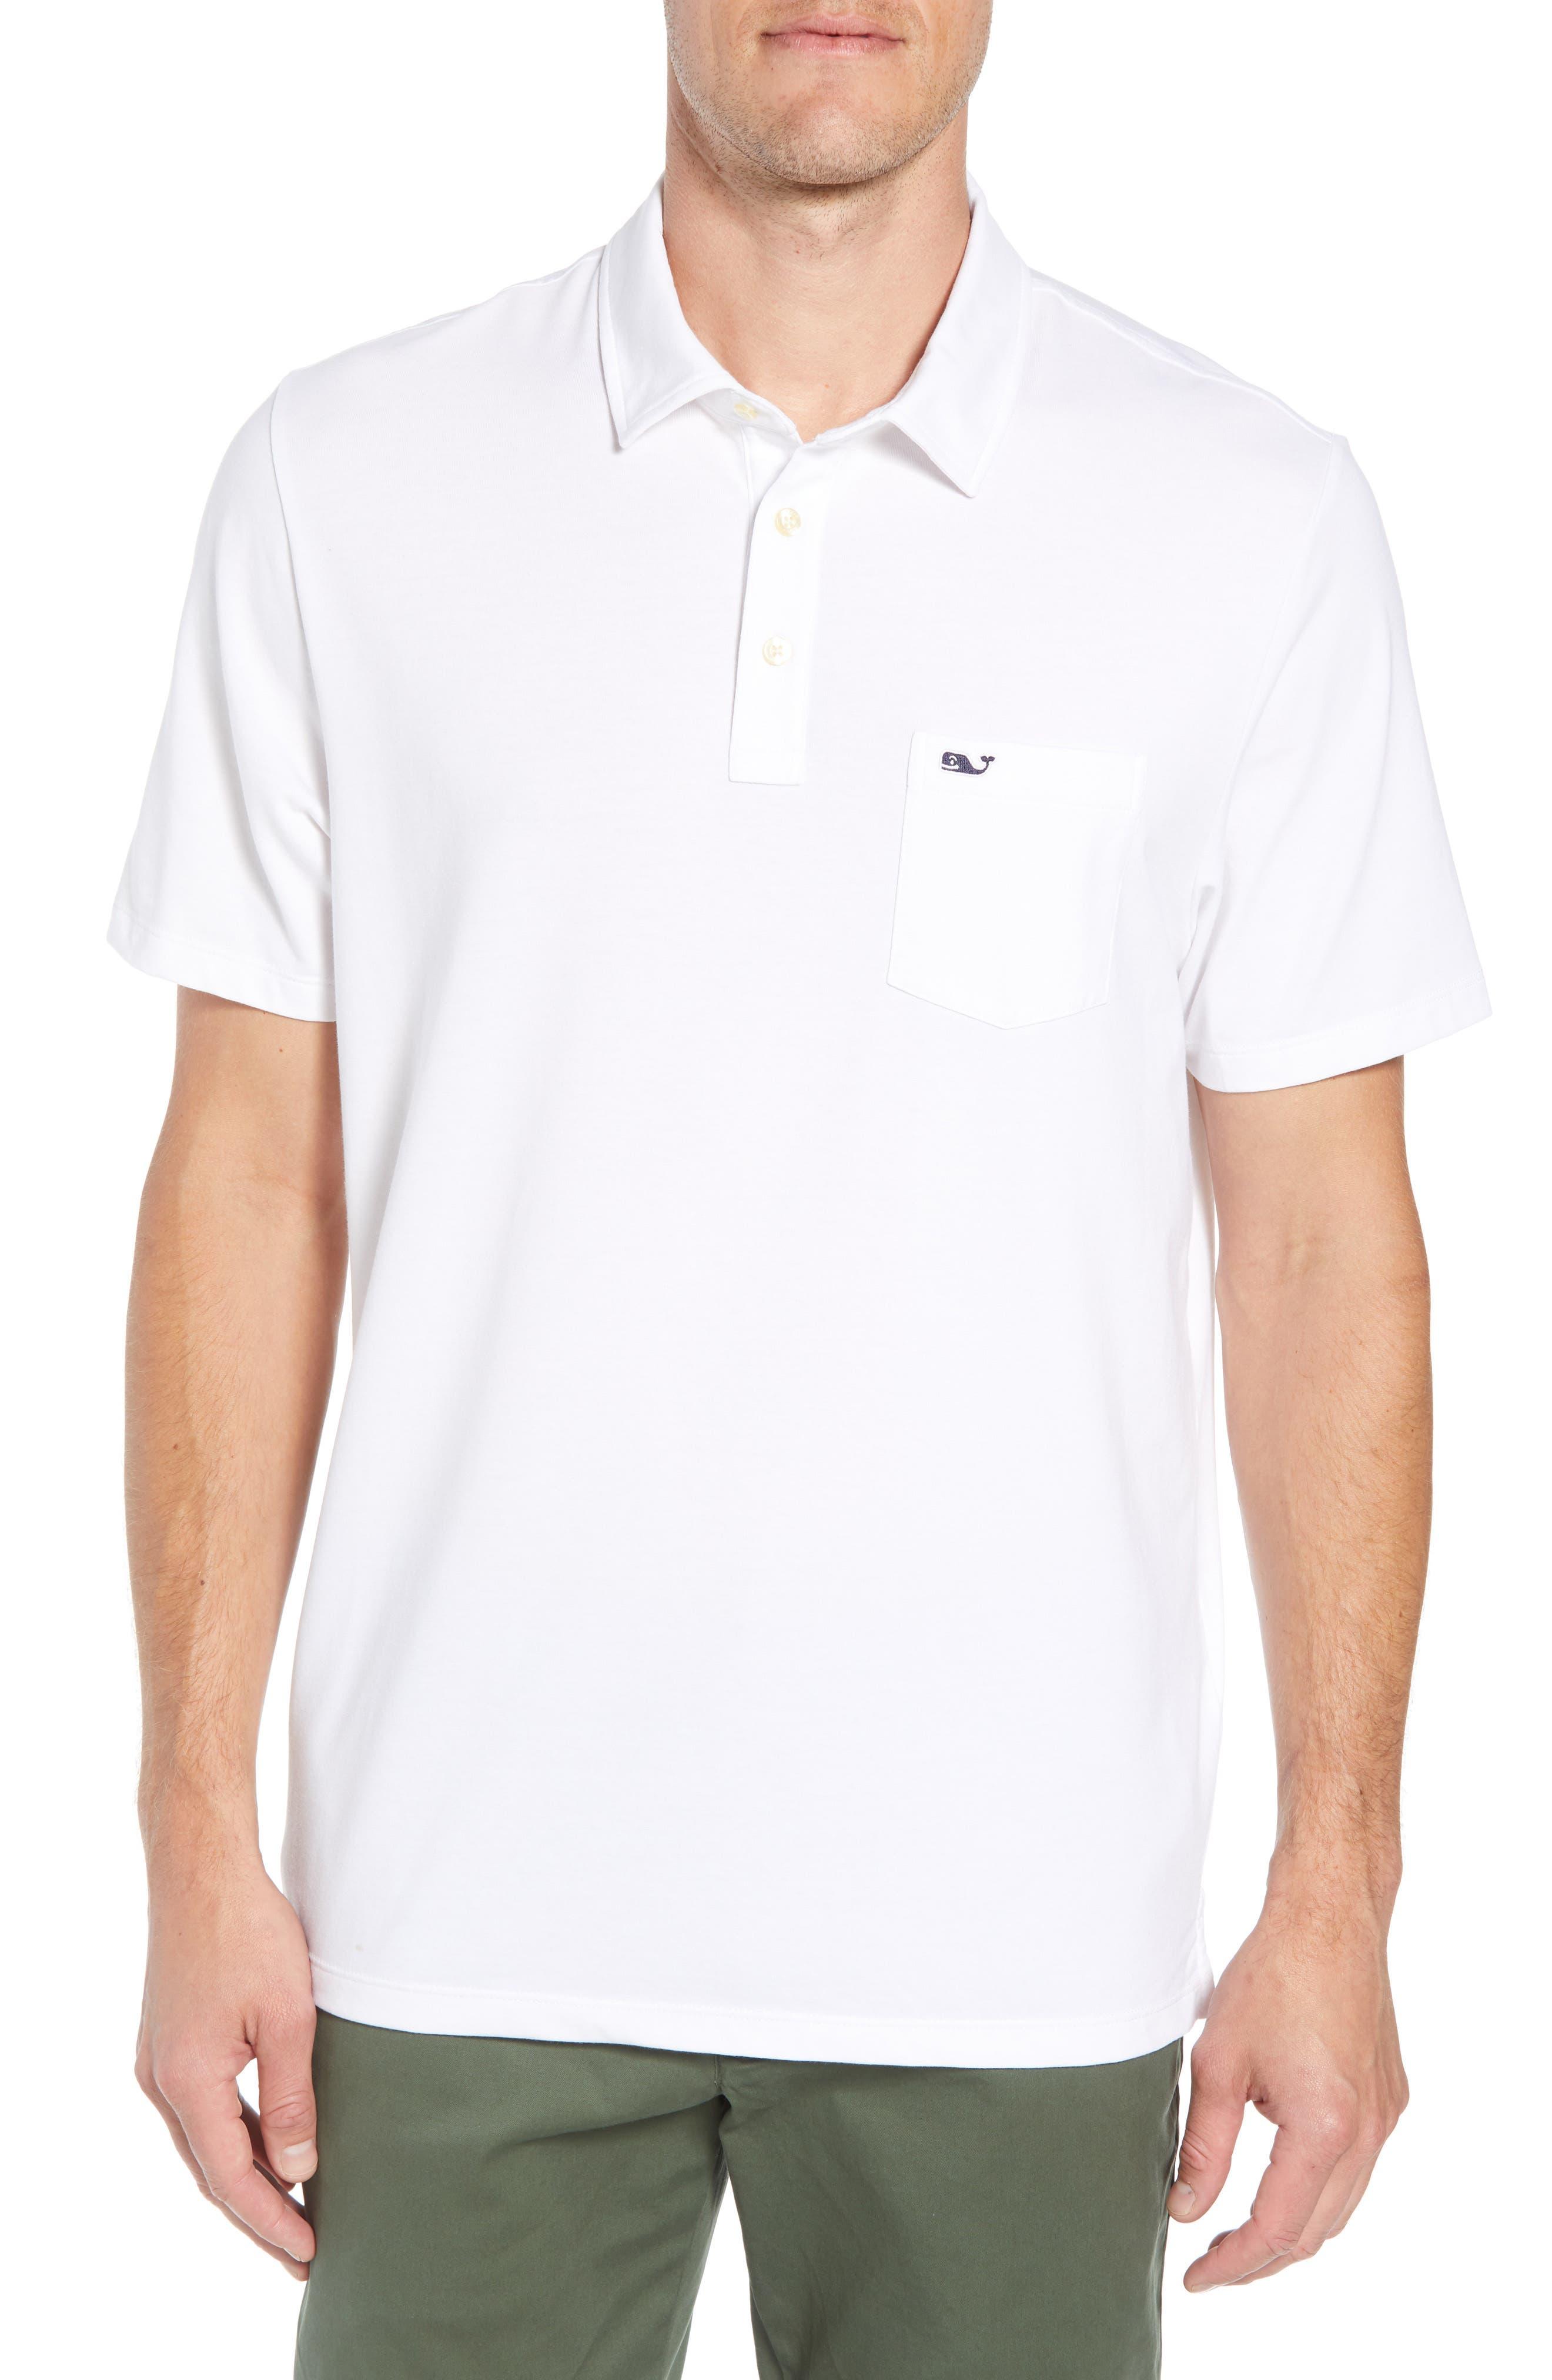 VINEYARD VINES, Edgartown Polo Shirt, Main thumbnail 1, color, WHITE CAP